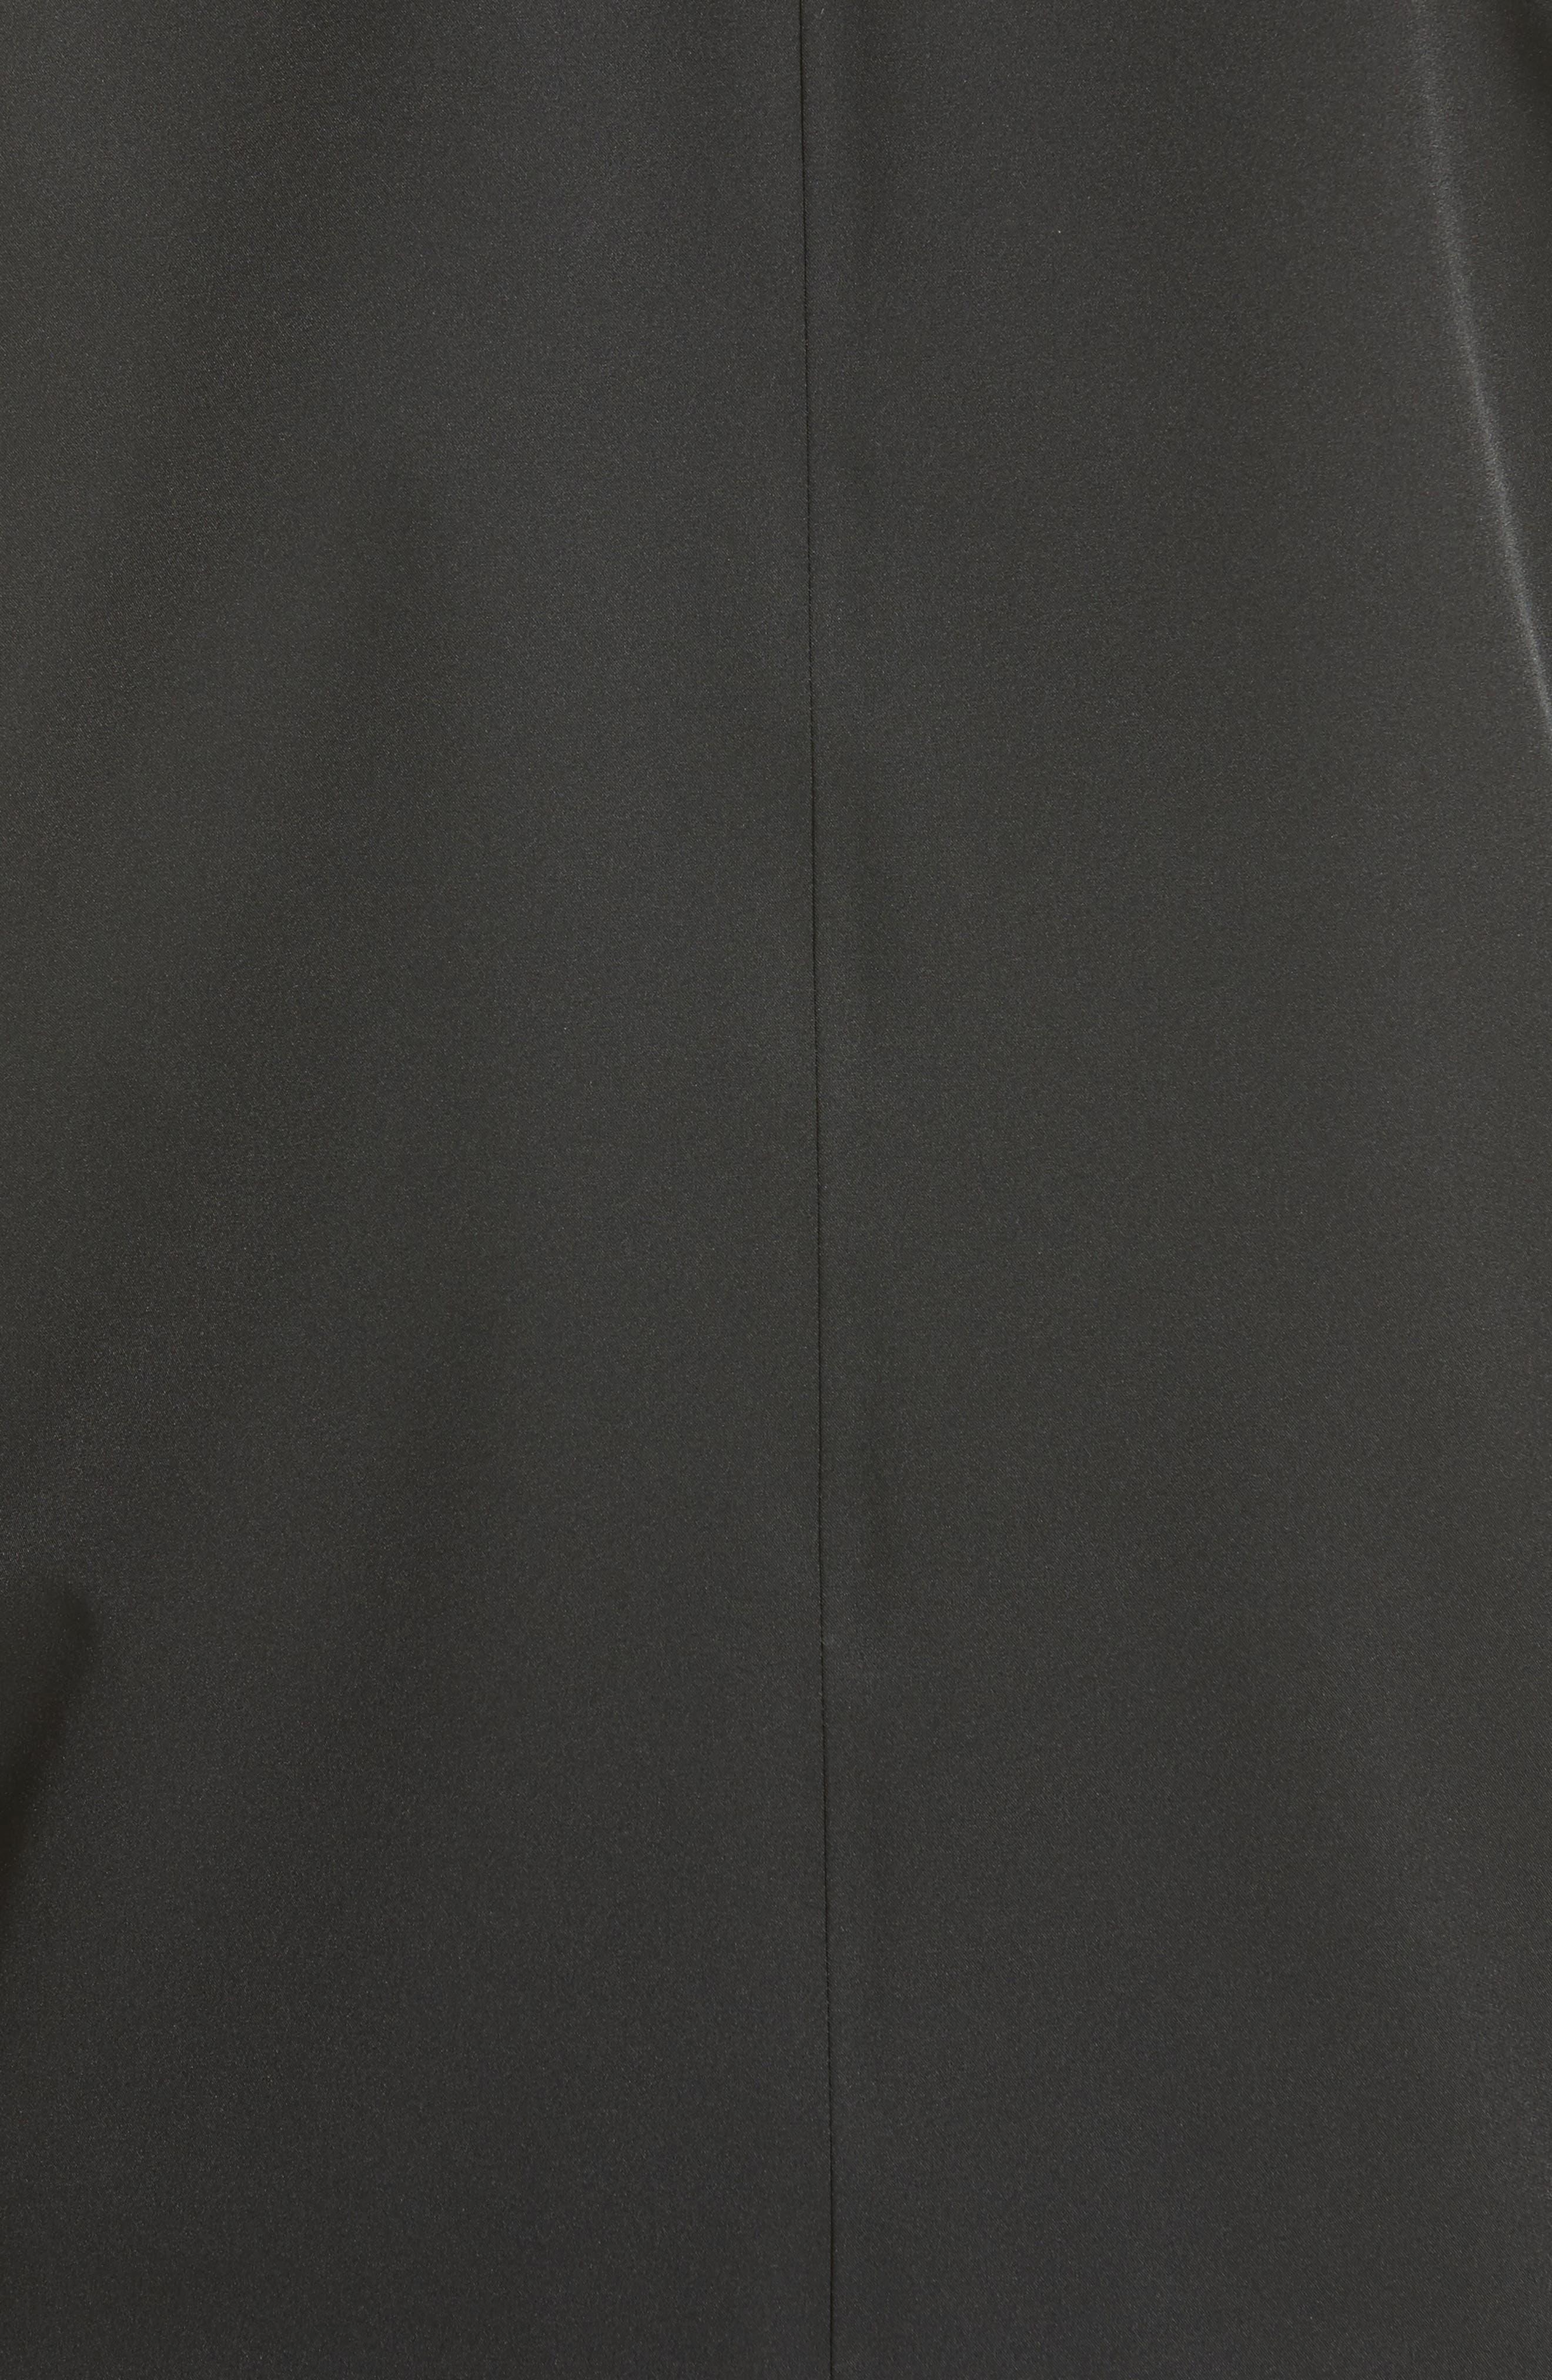 Troisvallees Jacket with Genuine Nutria Fur Collar,                             Alternate thumbnail 5, color,                             Black/ White